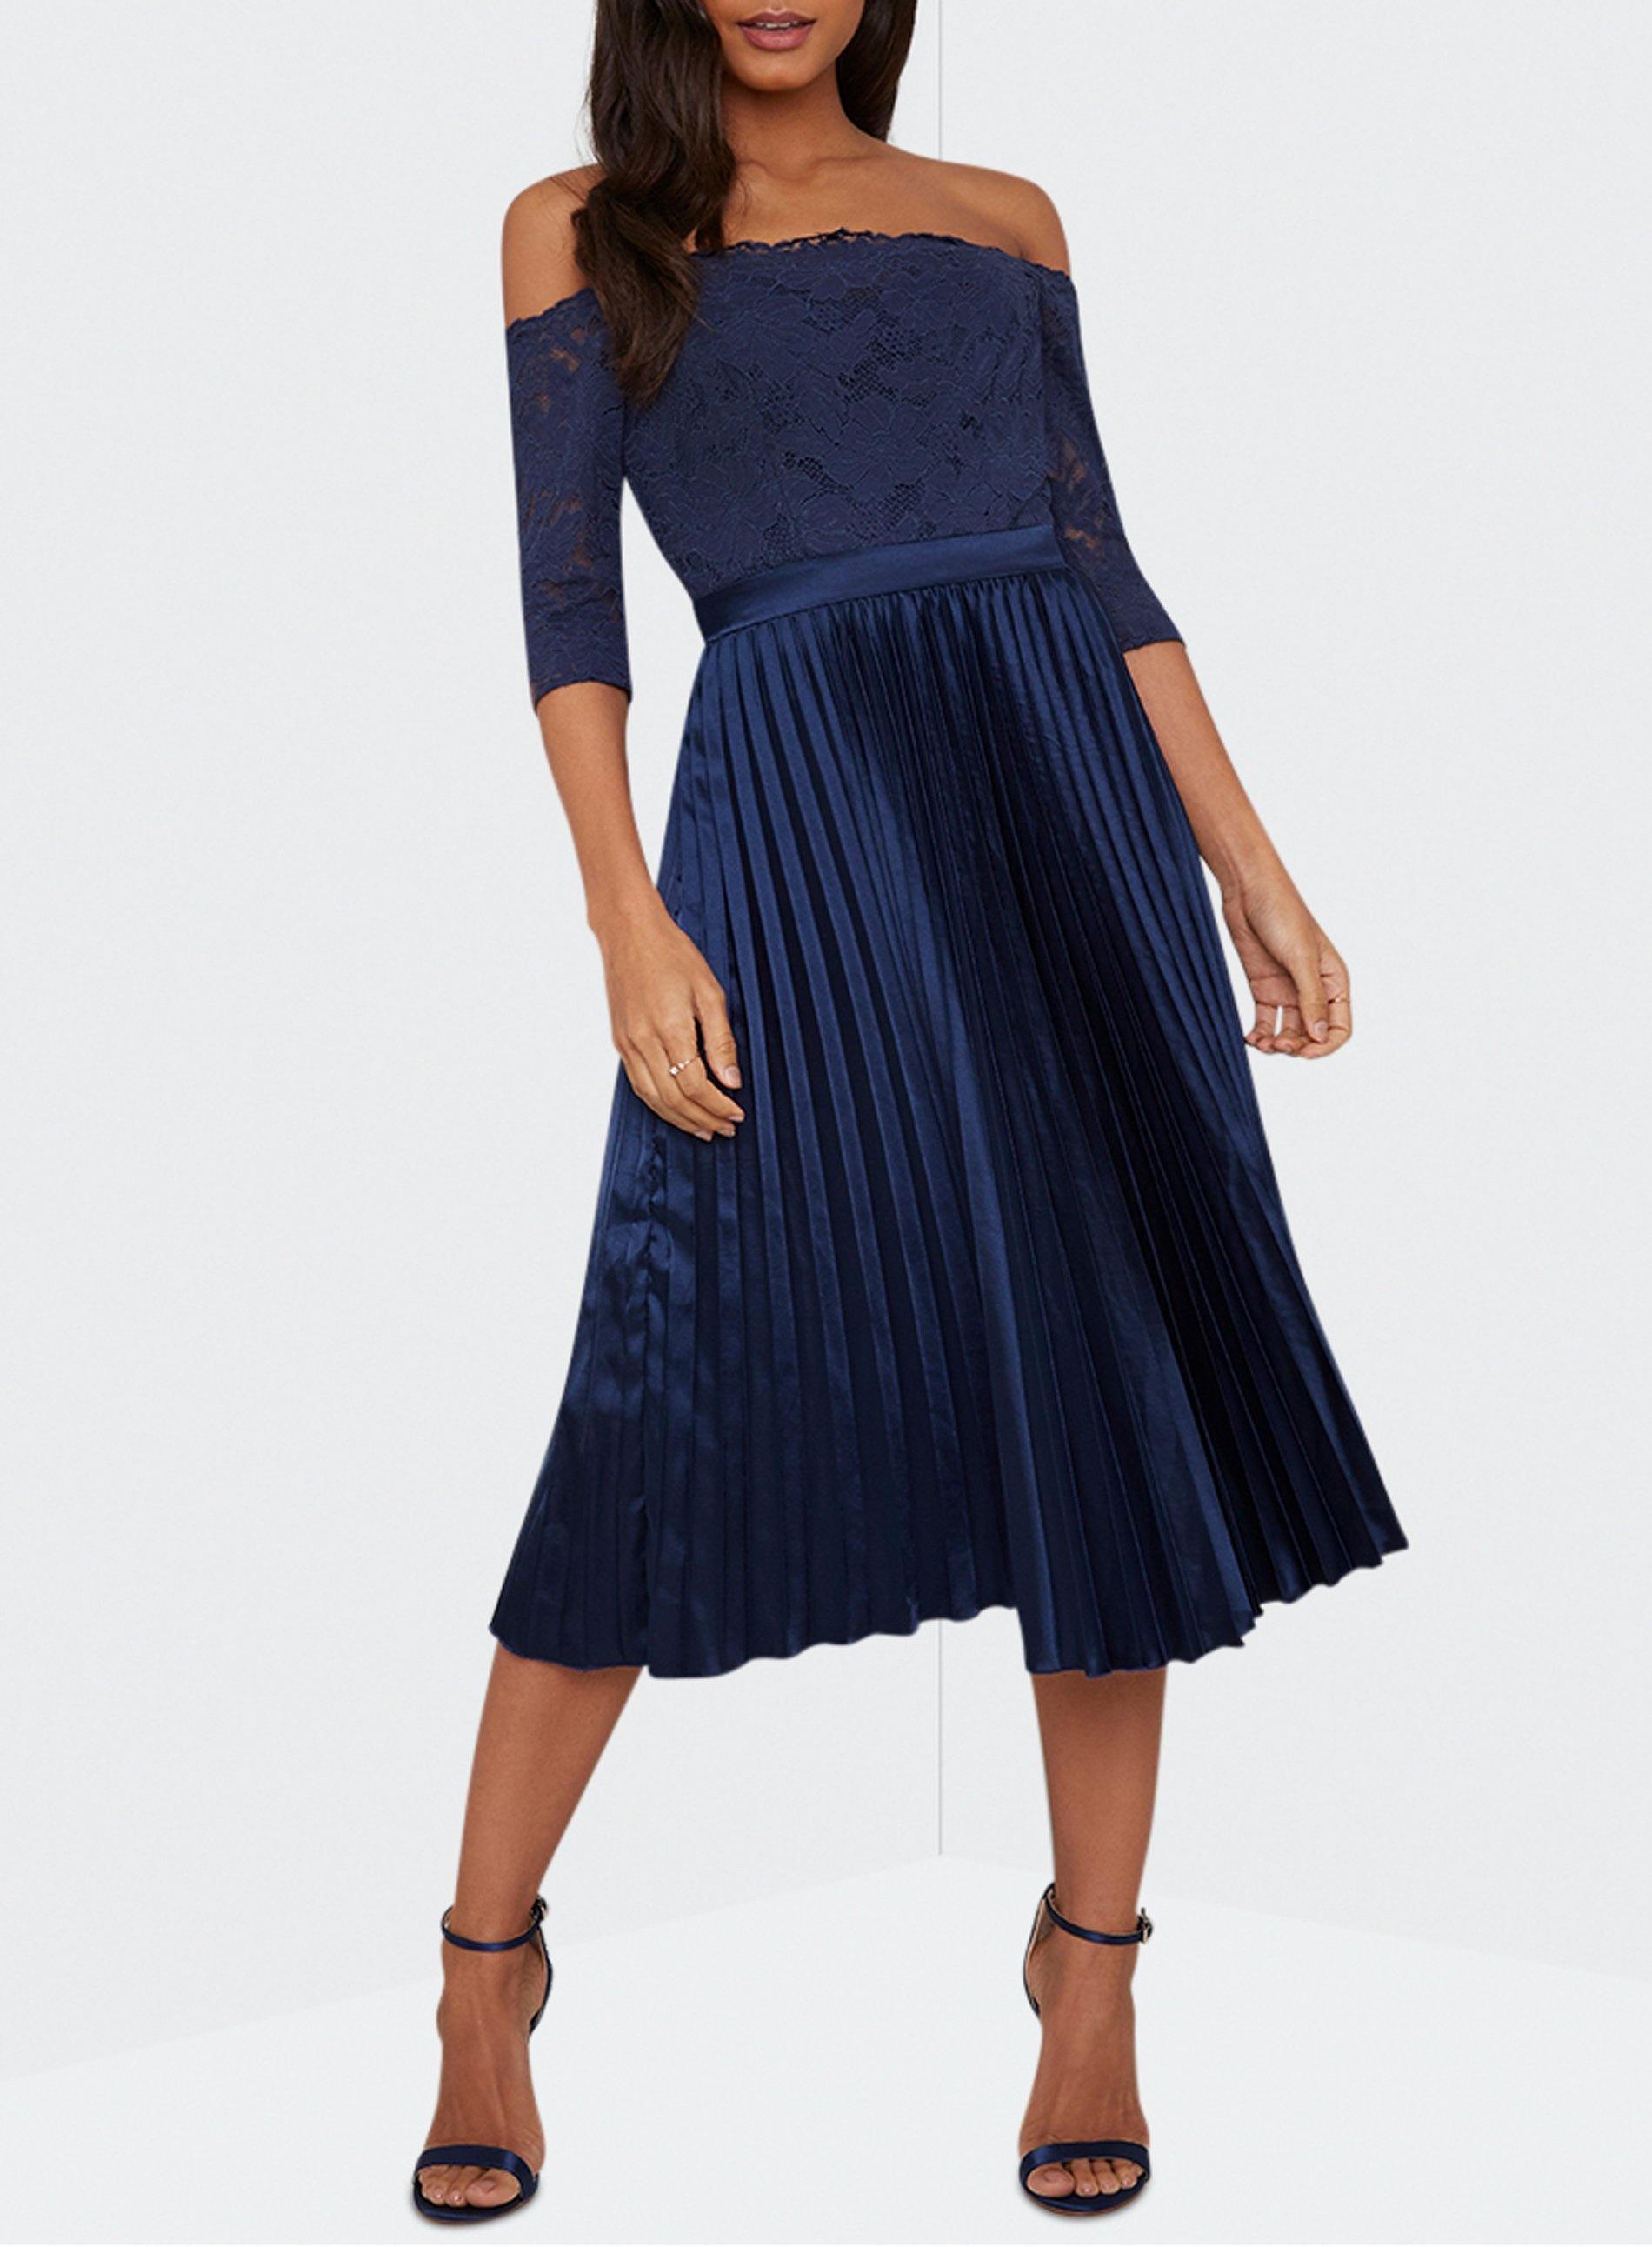 d494dddbd48 Dorothy Perkins - Blue Chi Chi London Navy Bardot Lace Midi Dress - Lyst.  View fullscreen